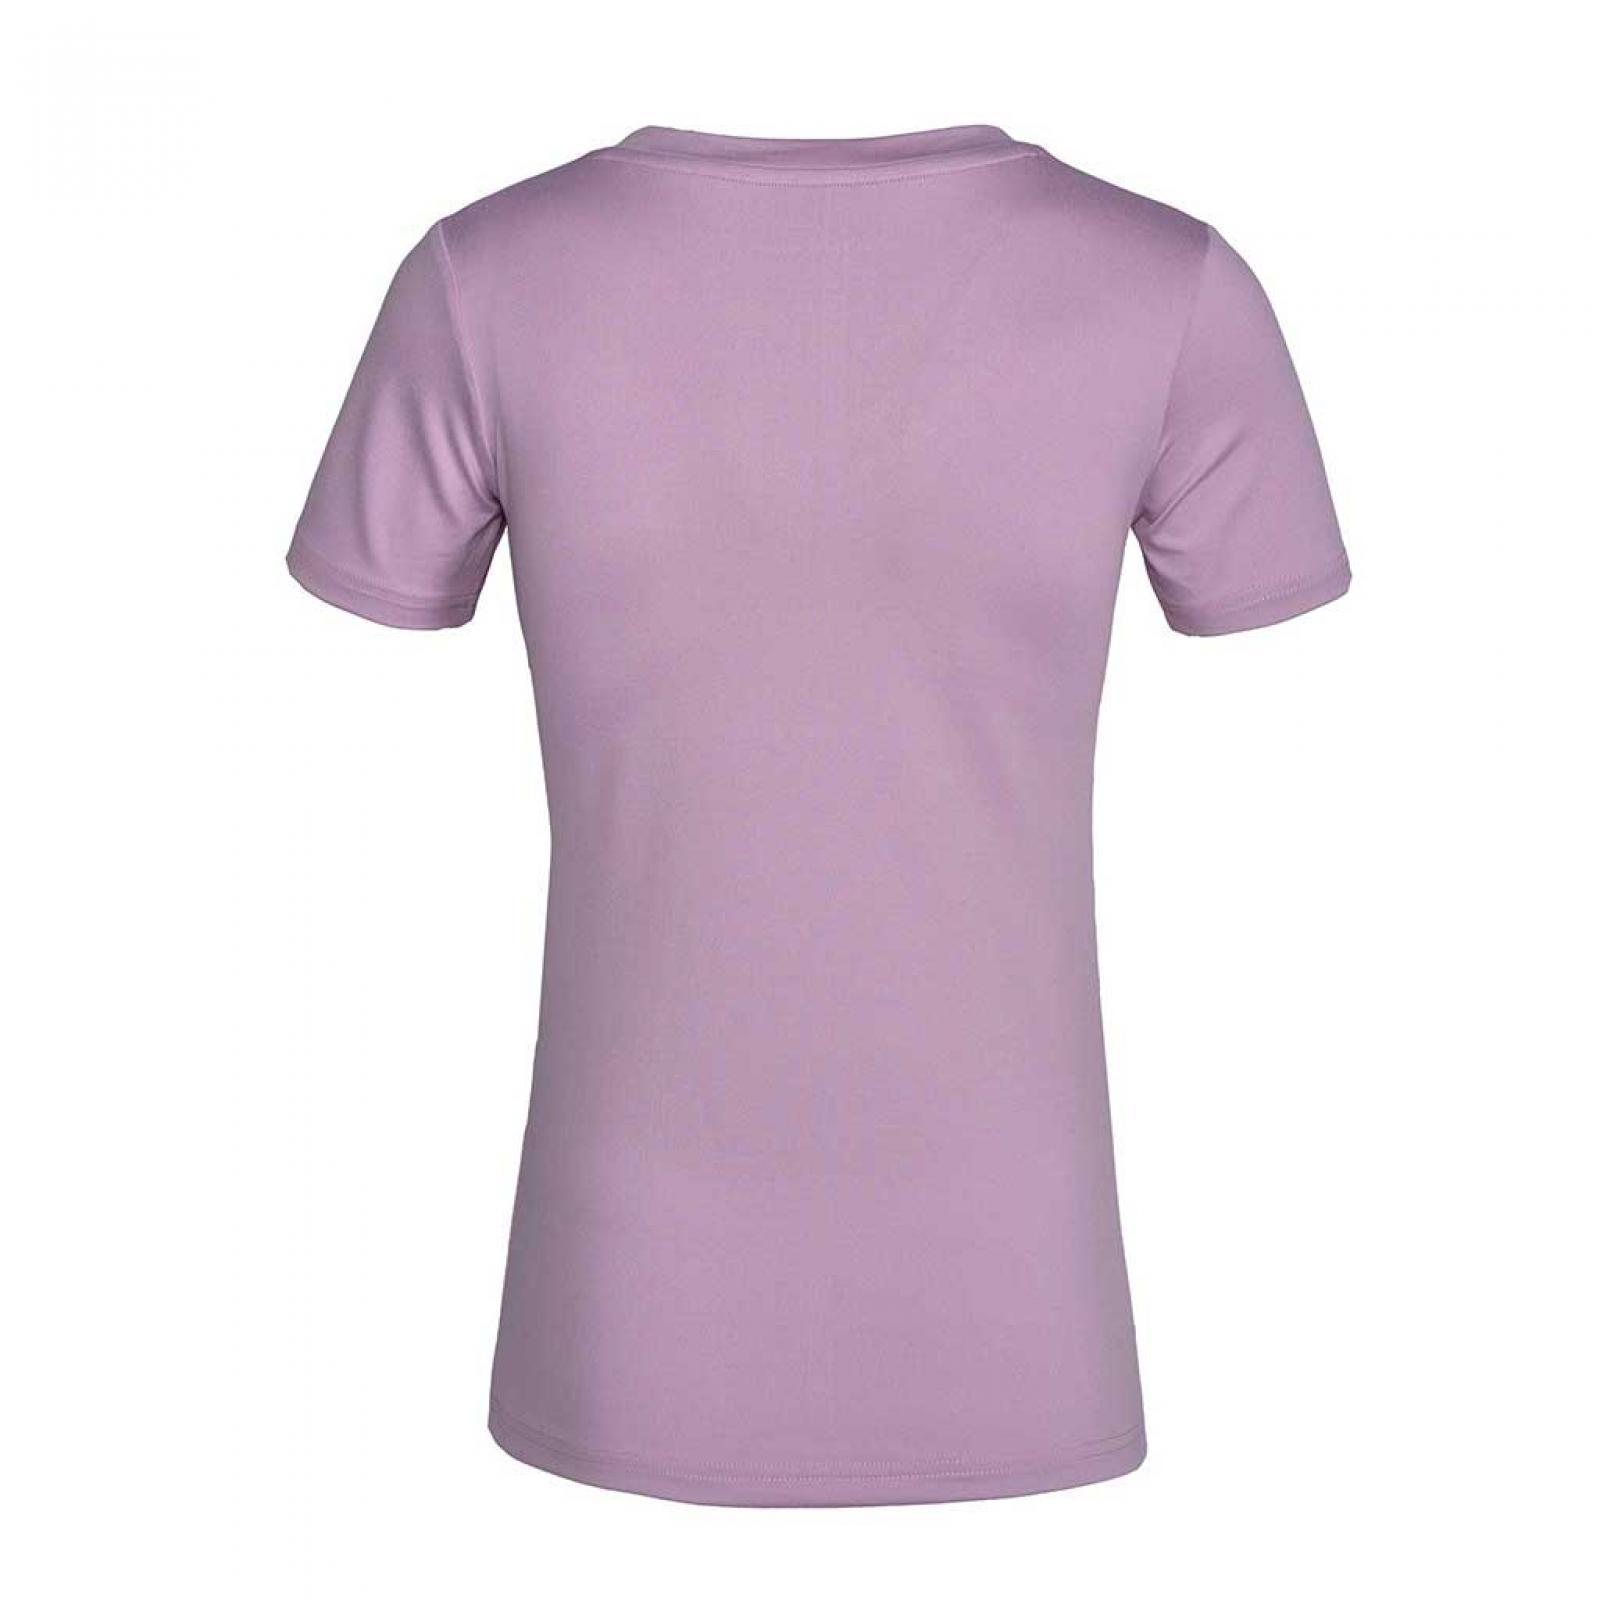 Kingsland Luna T-shirt